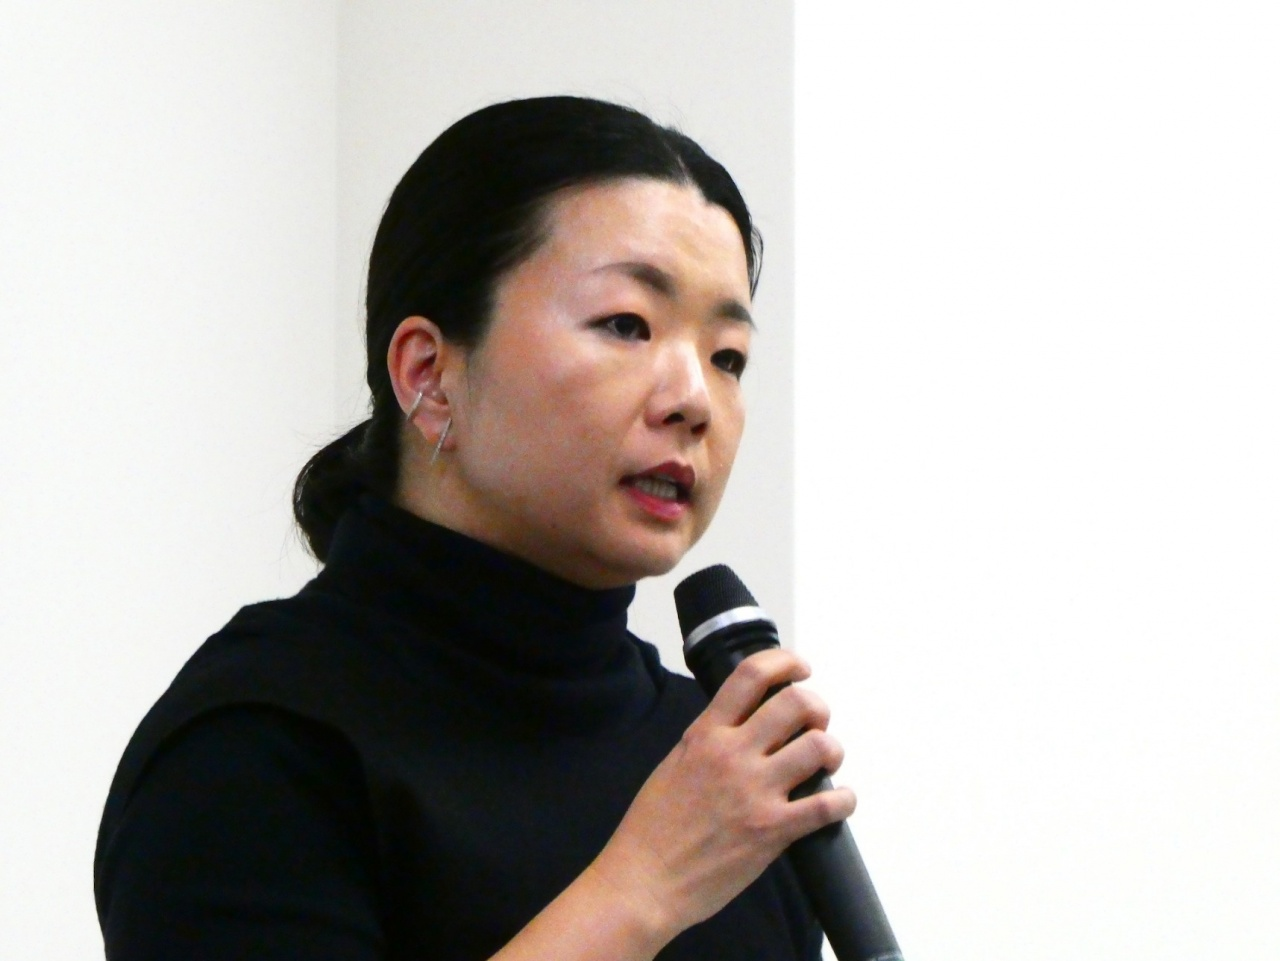 笹倉香奈教授 (甲南大学法学部・SBS検証プロジェクト共同代表・犯罪学研究センター客員研究員)